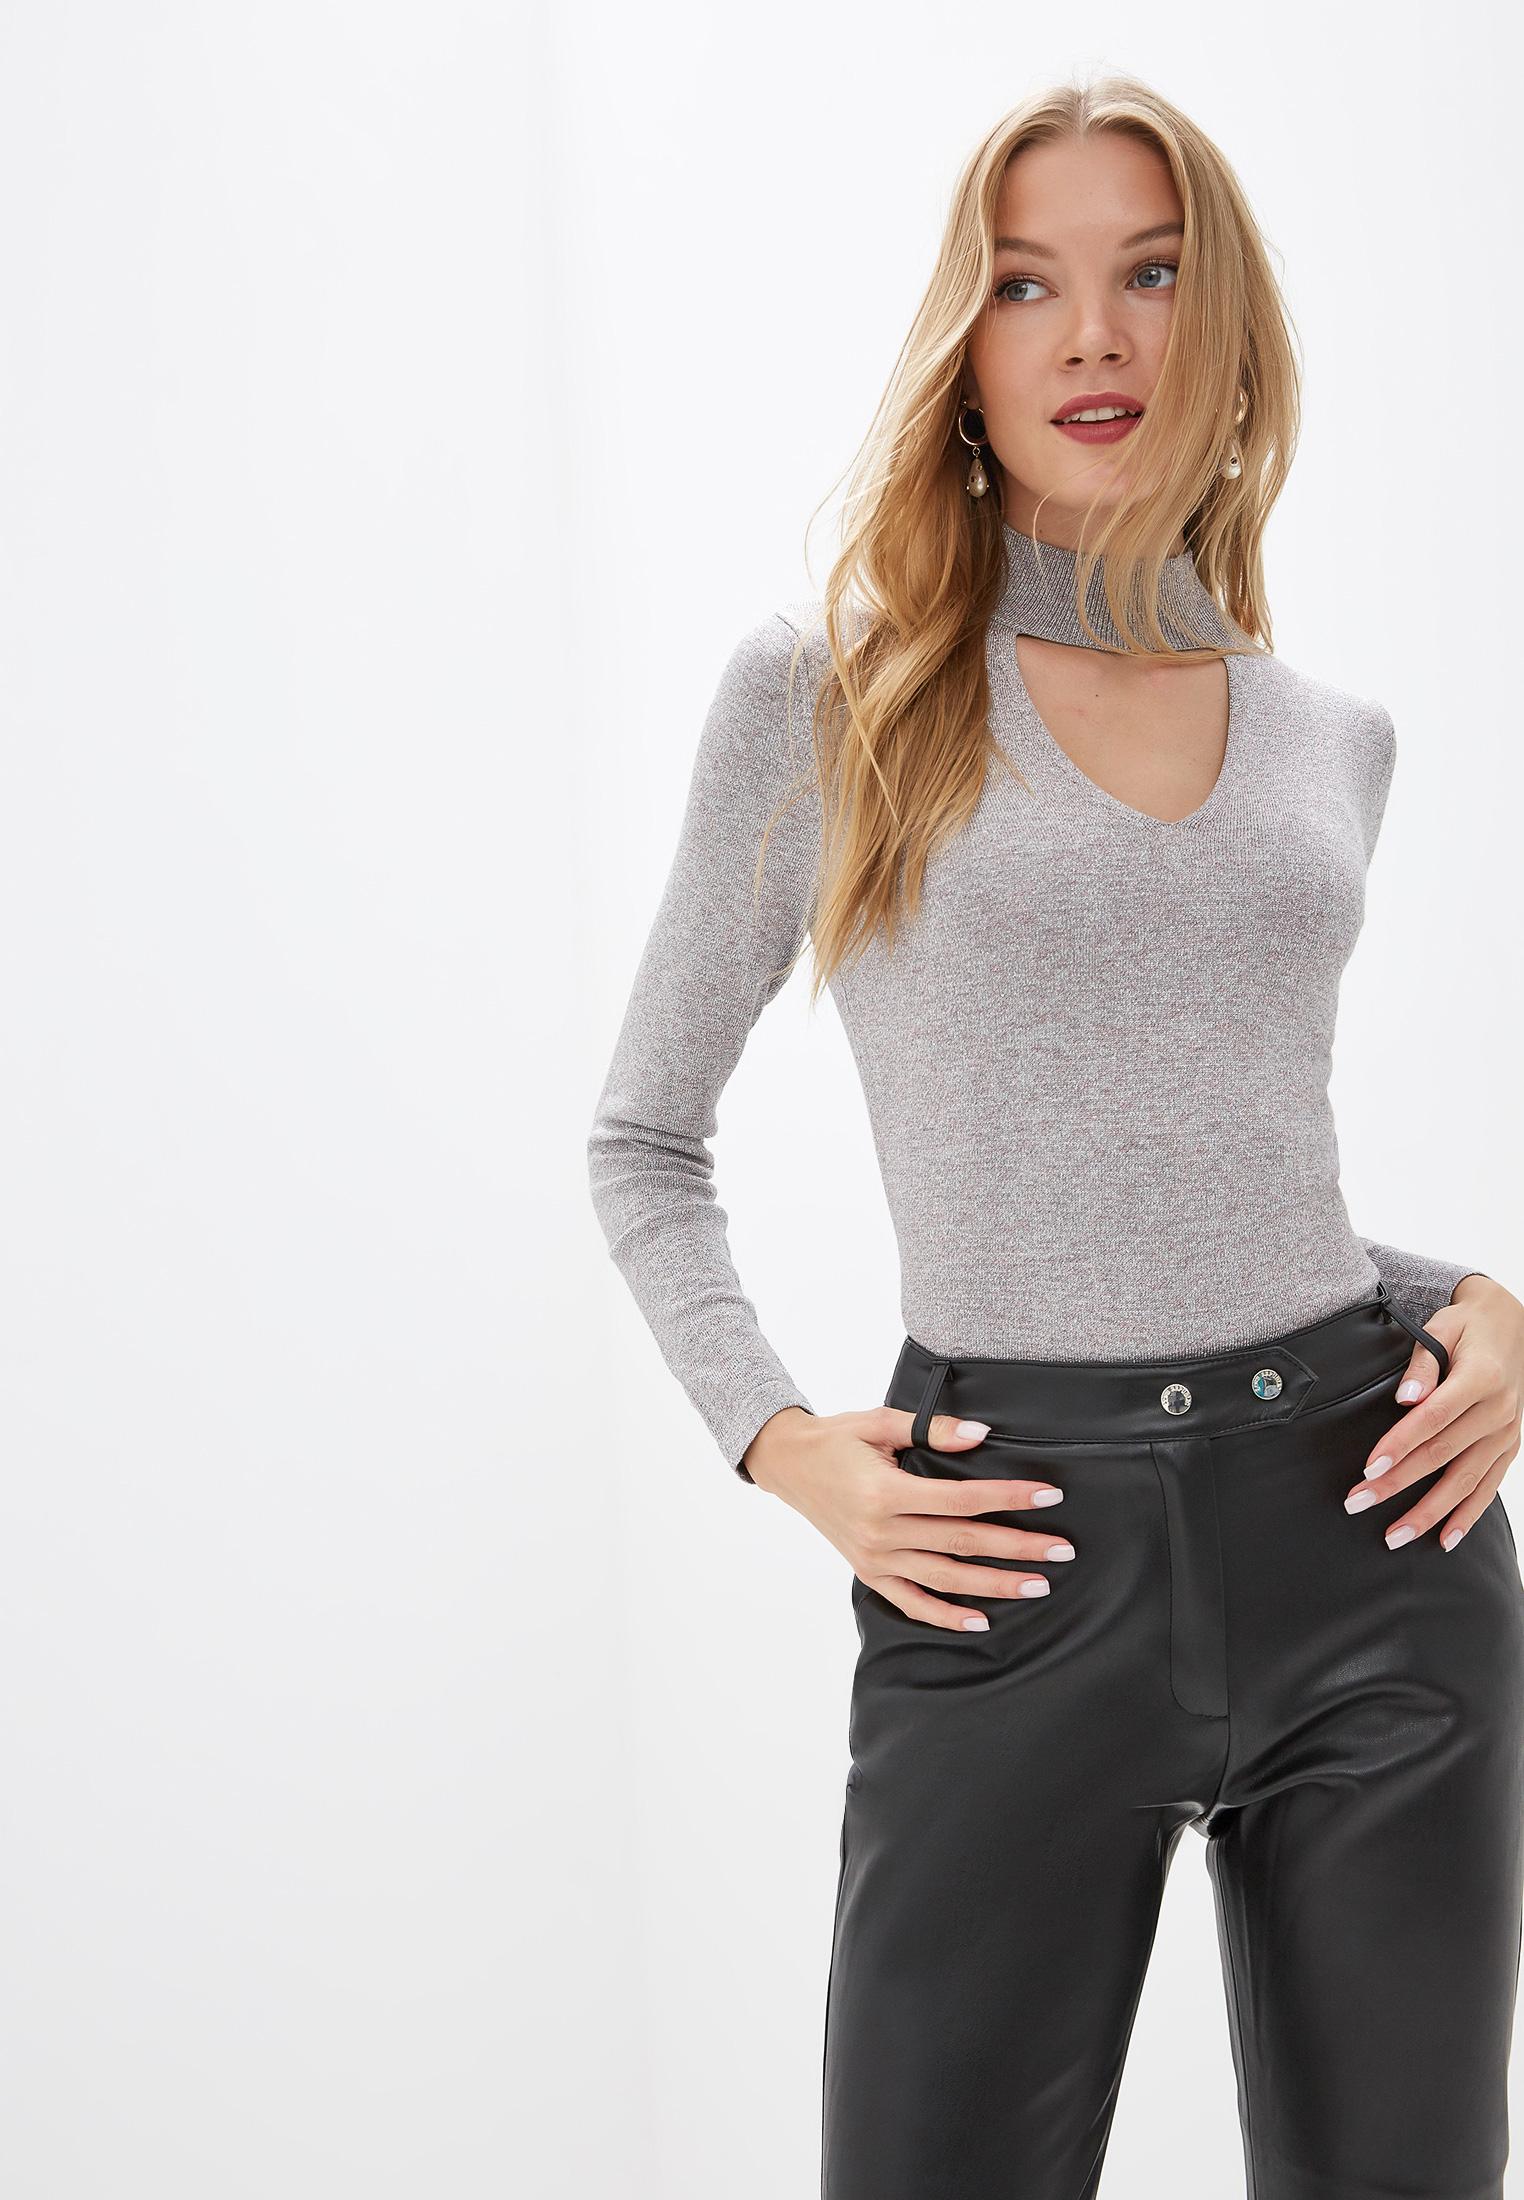 Джемпер, Love Republic, цвет: серый. Артикул: MP002XW0DFE2. Одежда / Джемперы, свитеры и кардиганы